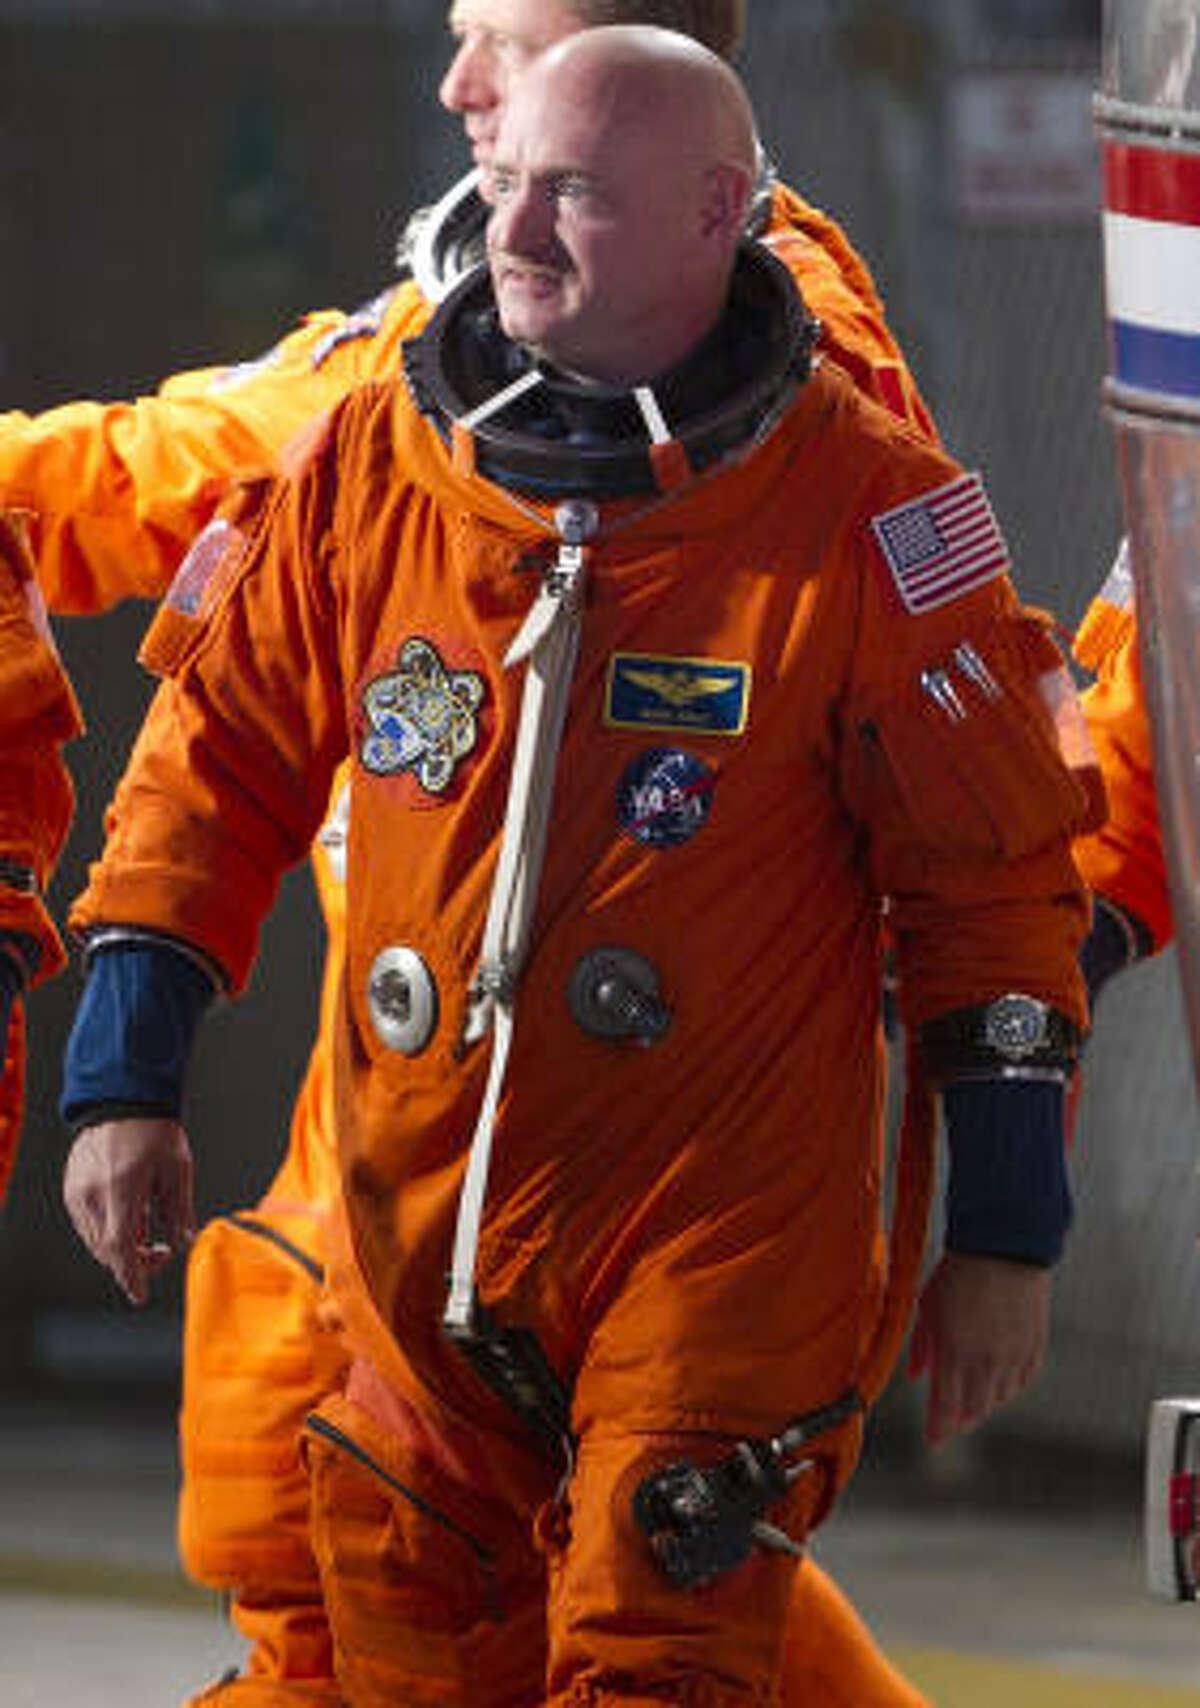 The commander heads for the orbiter.